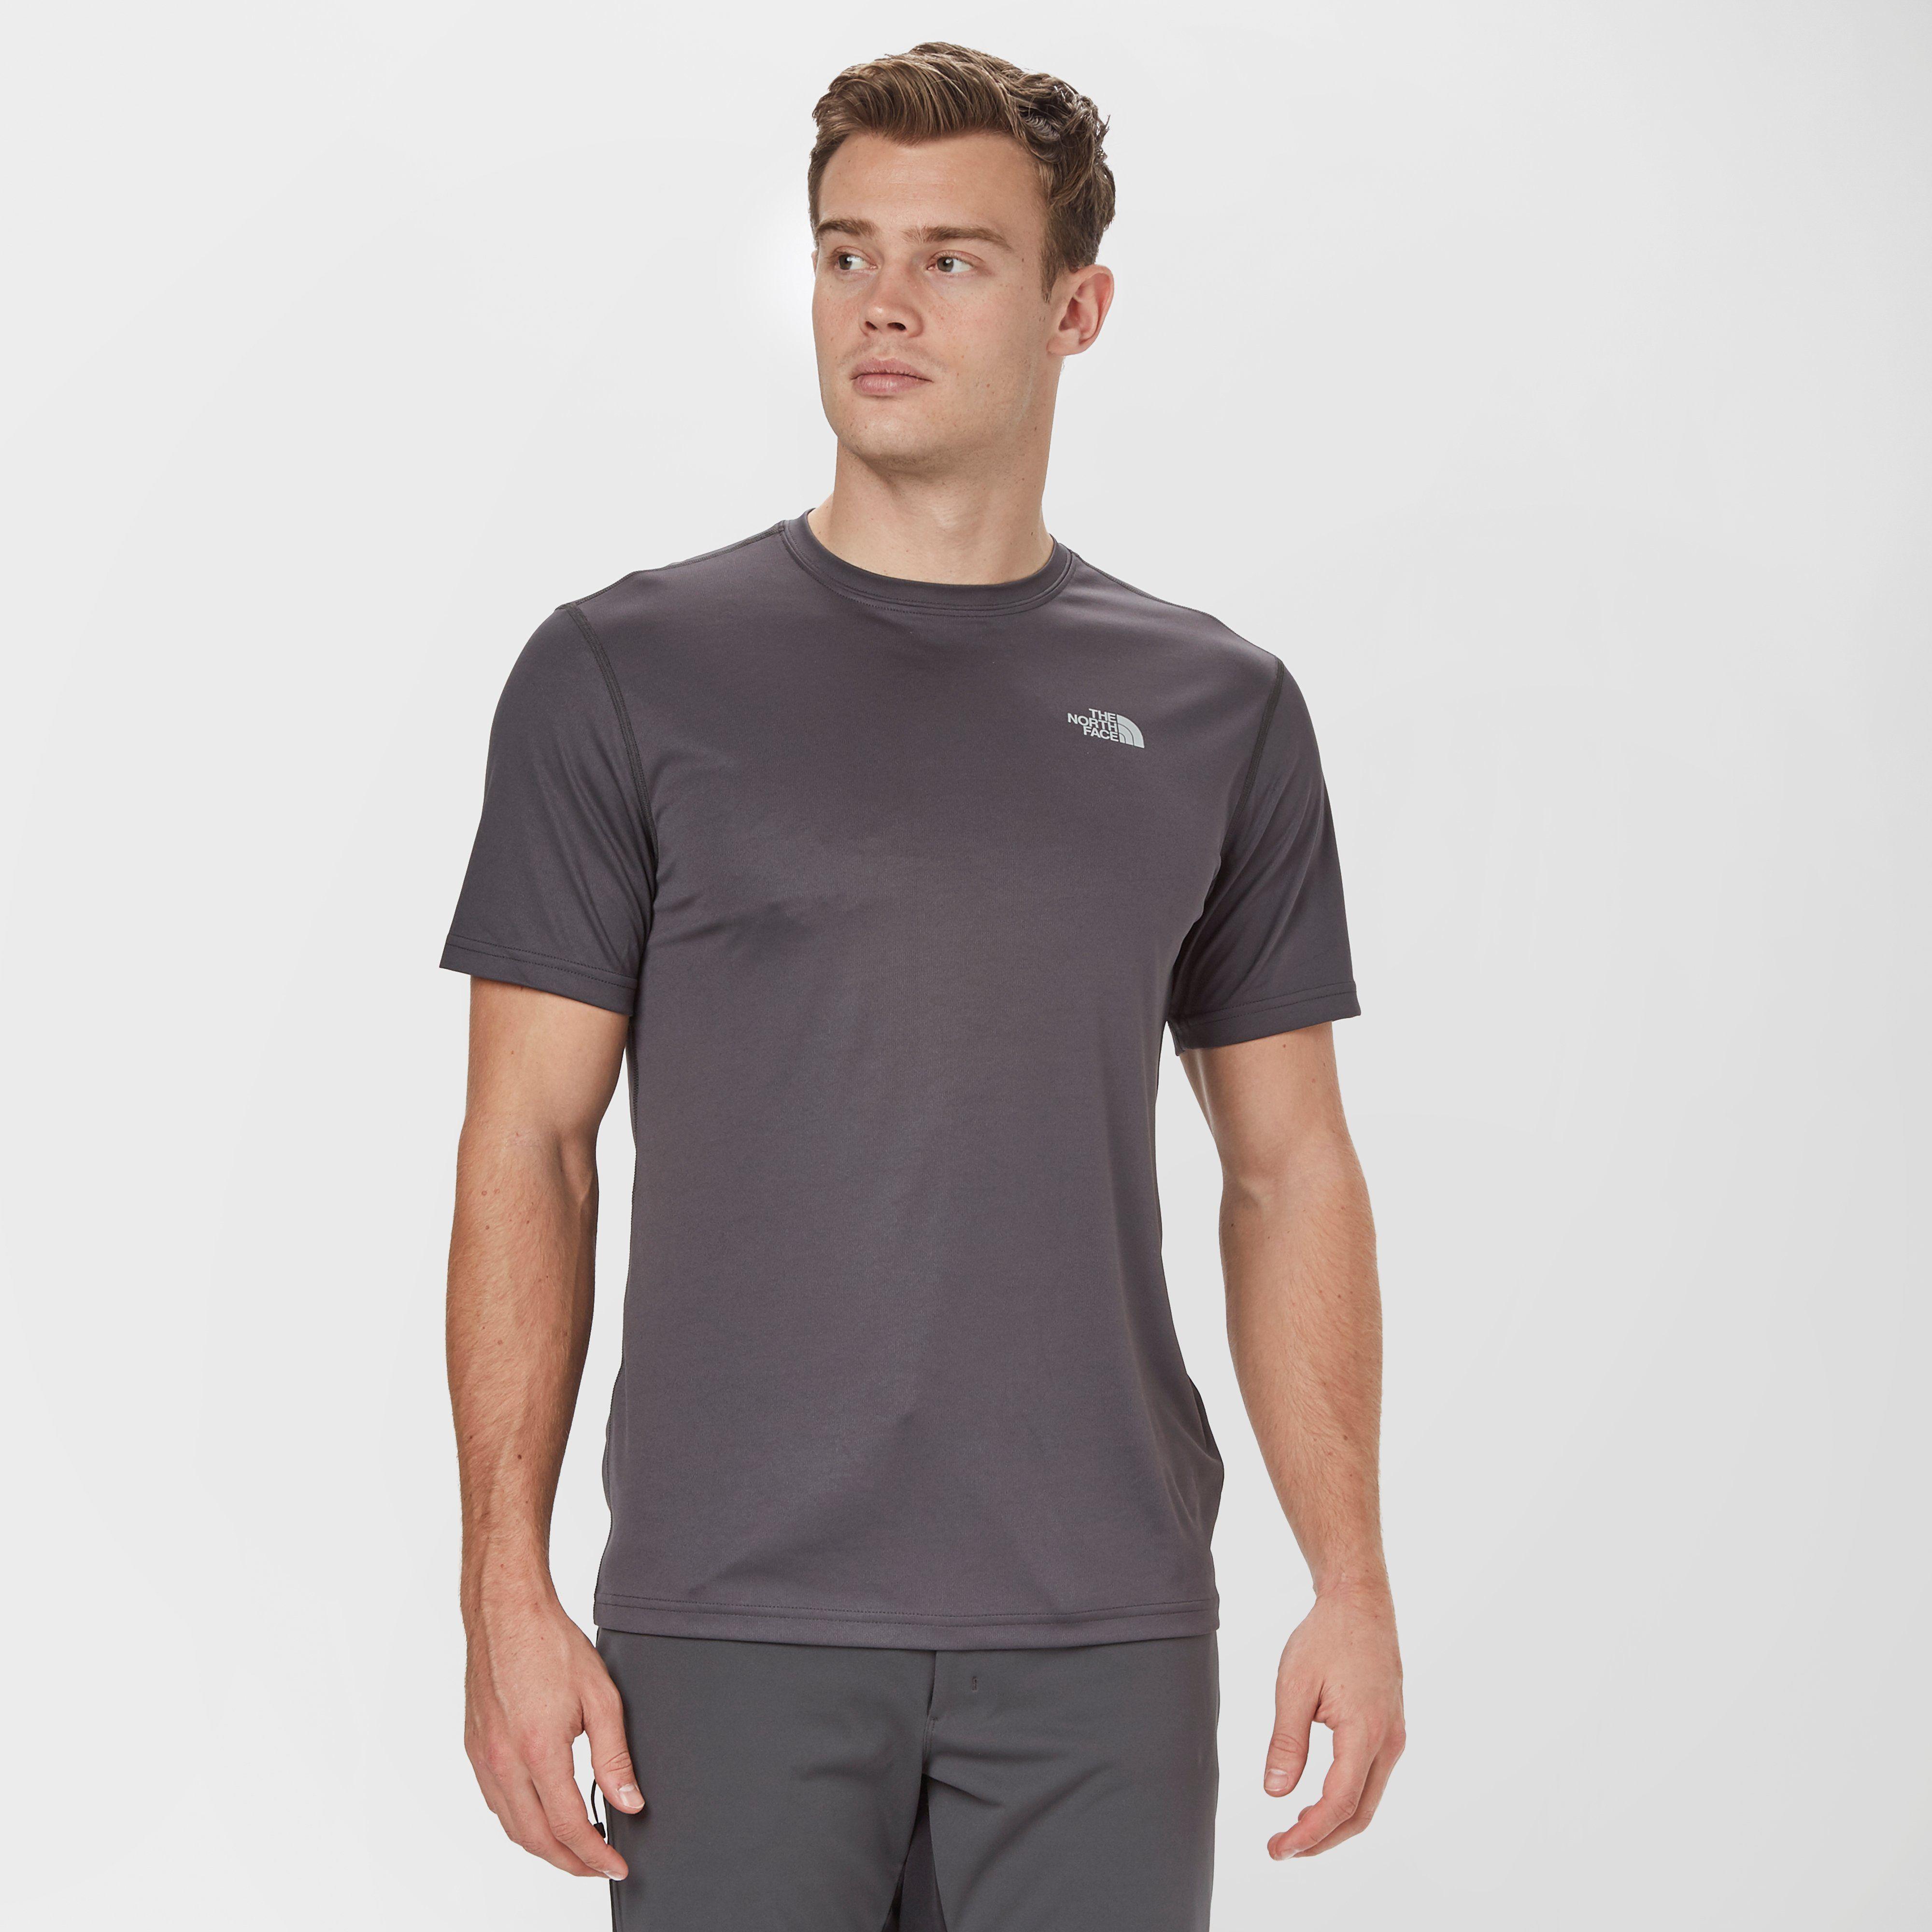 THE NORTH FACE Men's Mountain Athletics Flex T-Shirt